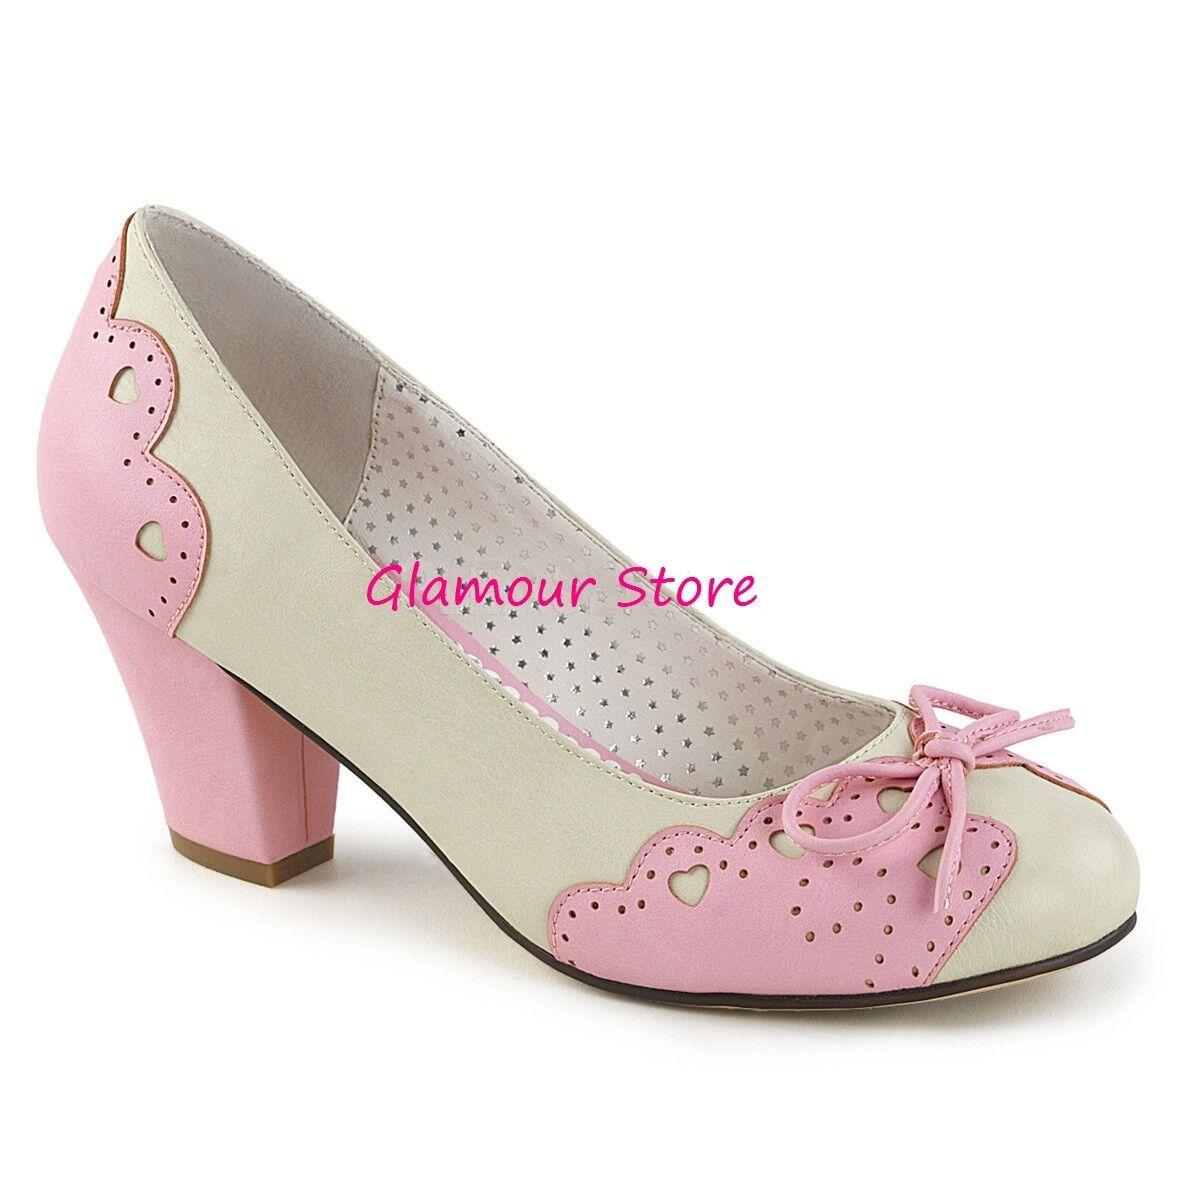 Descuento de liquidación Sexy DECOLTE' tacco 6,5 dal 35 al 41 ROSA/CREMA fiocchetto scarpe PIN UP glamour